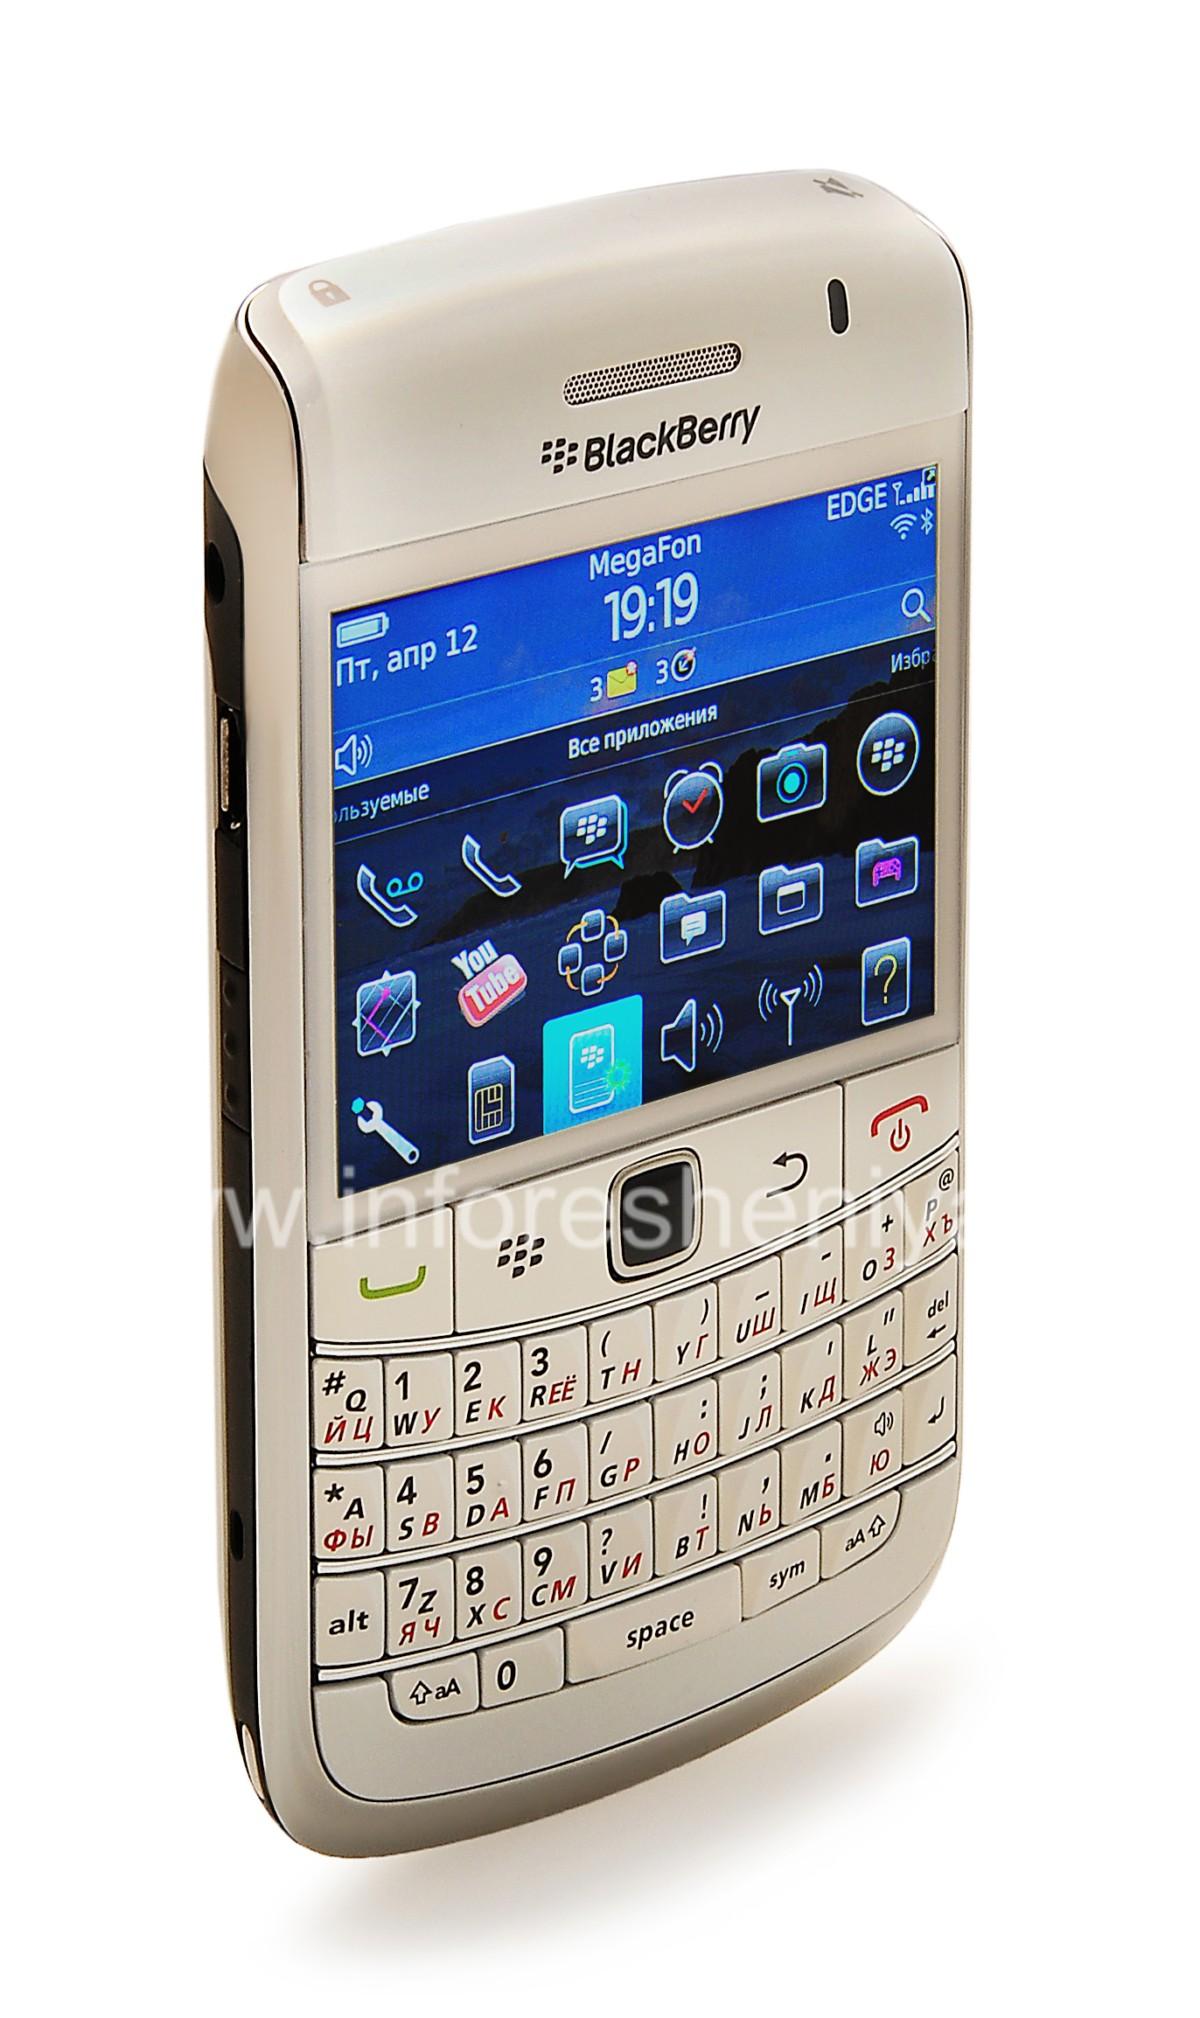 blackberry curve 9700 white - photo #19